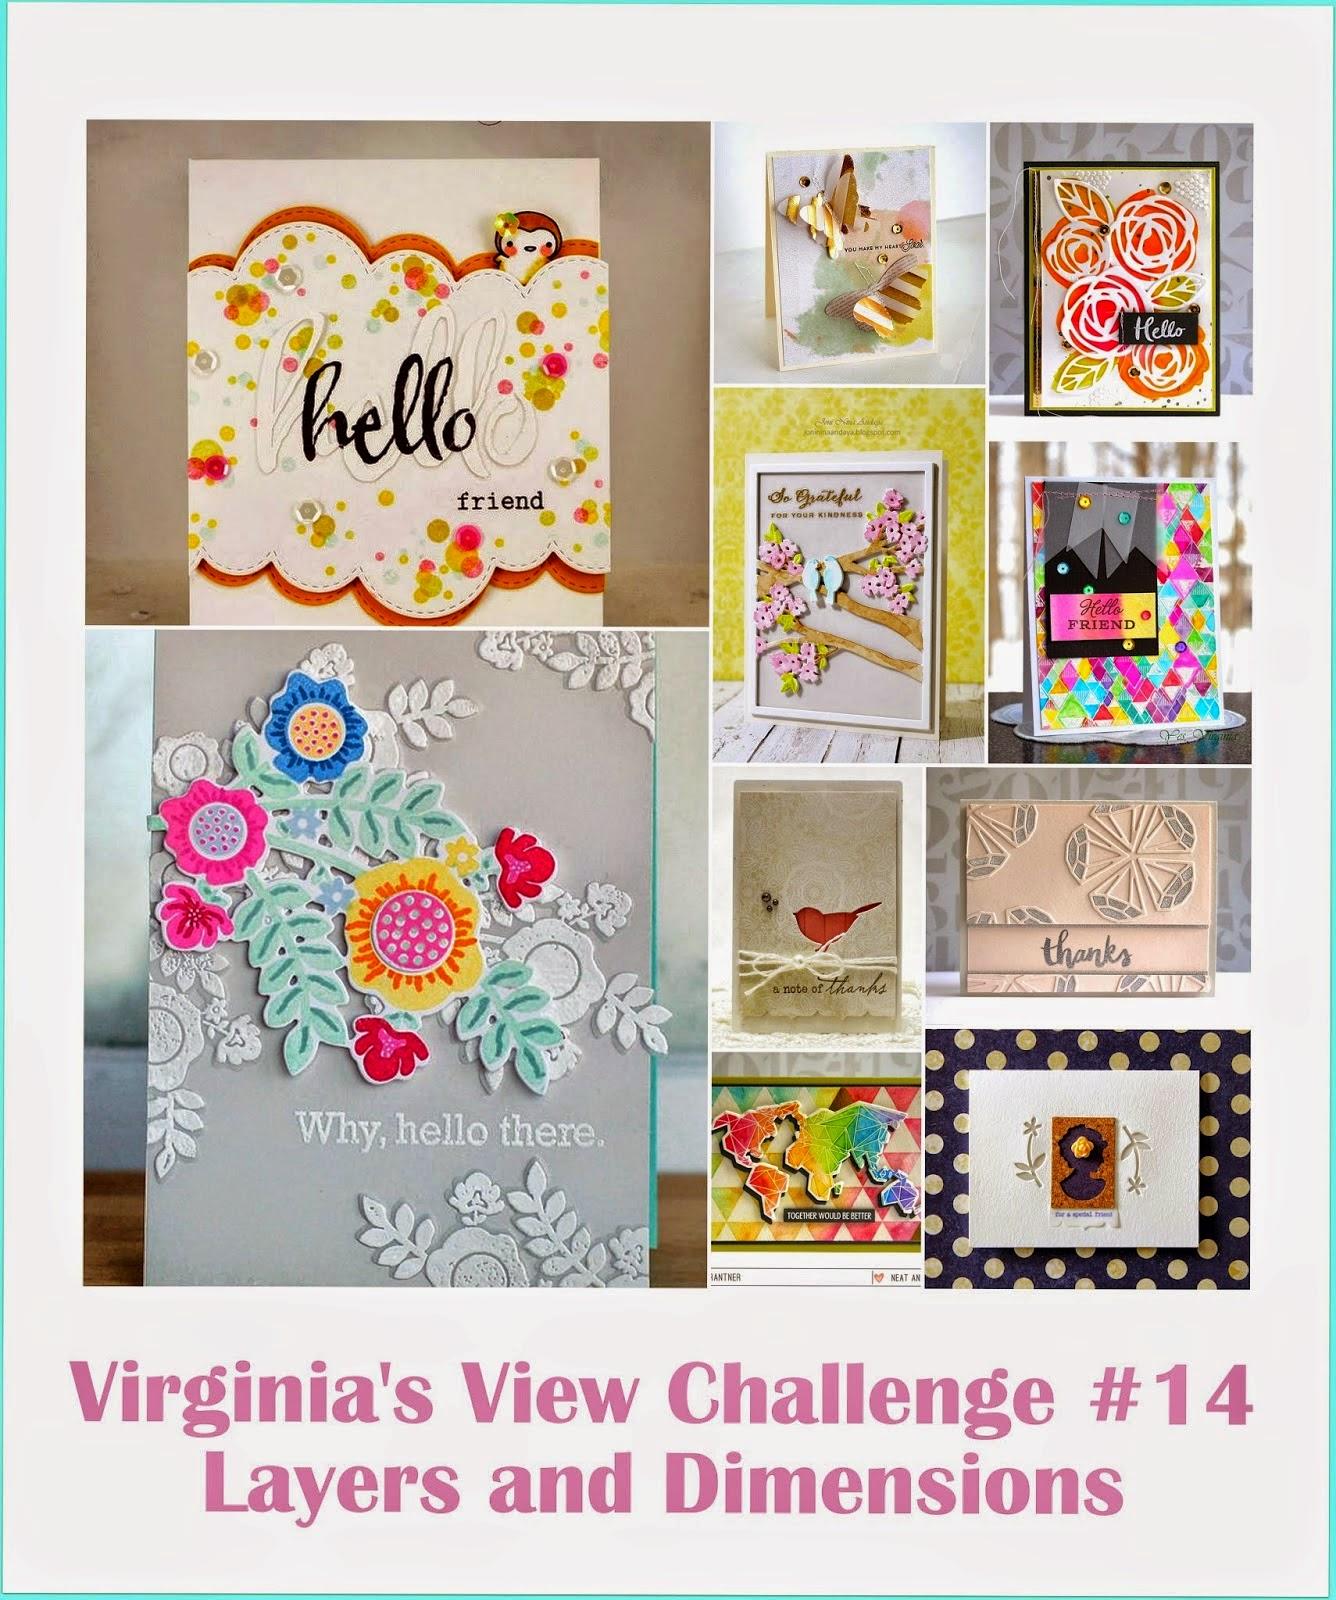 http://virginiasviewchallenge.blogspot.ca/2015/04/virginias-view-challenge-14.html